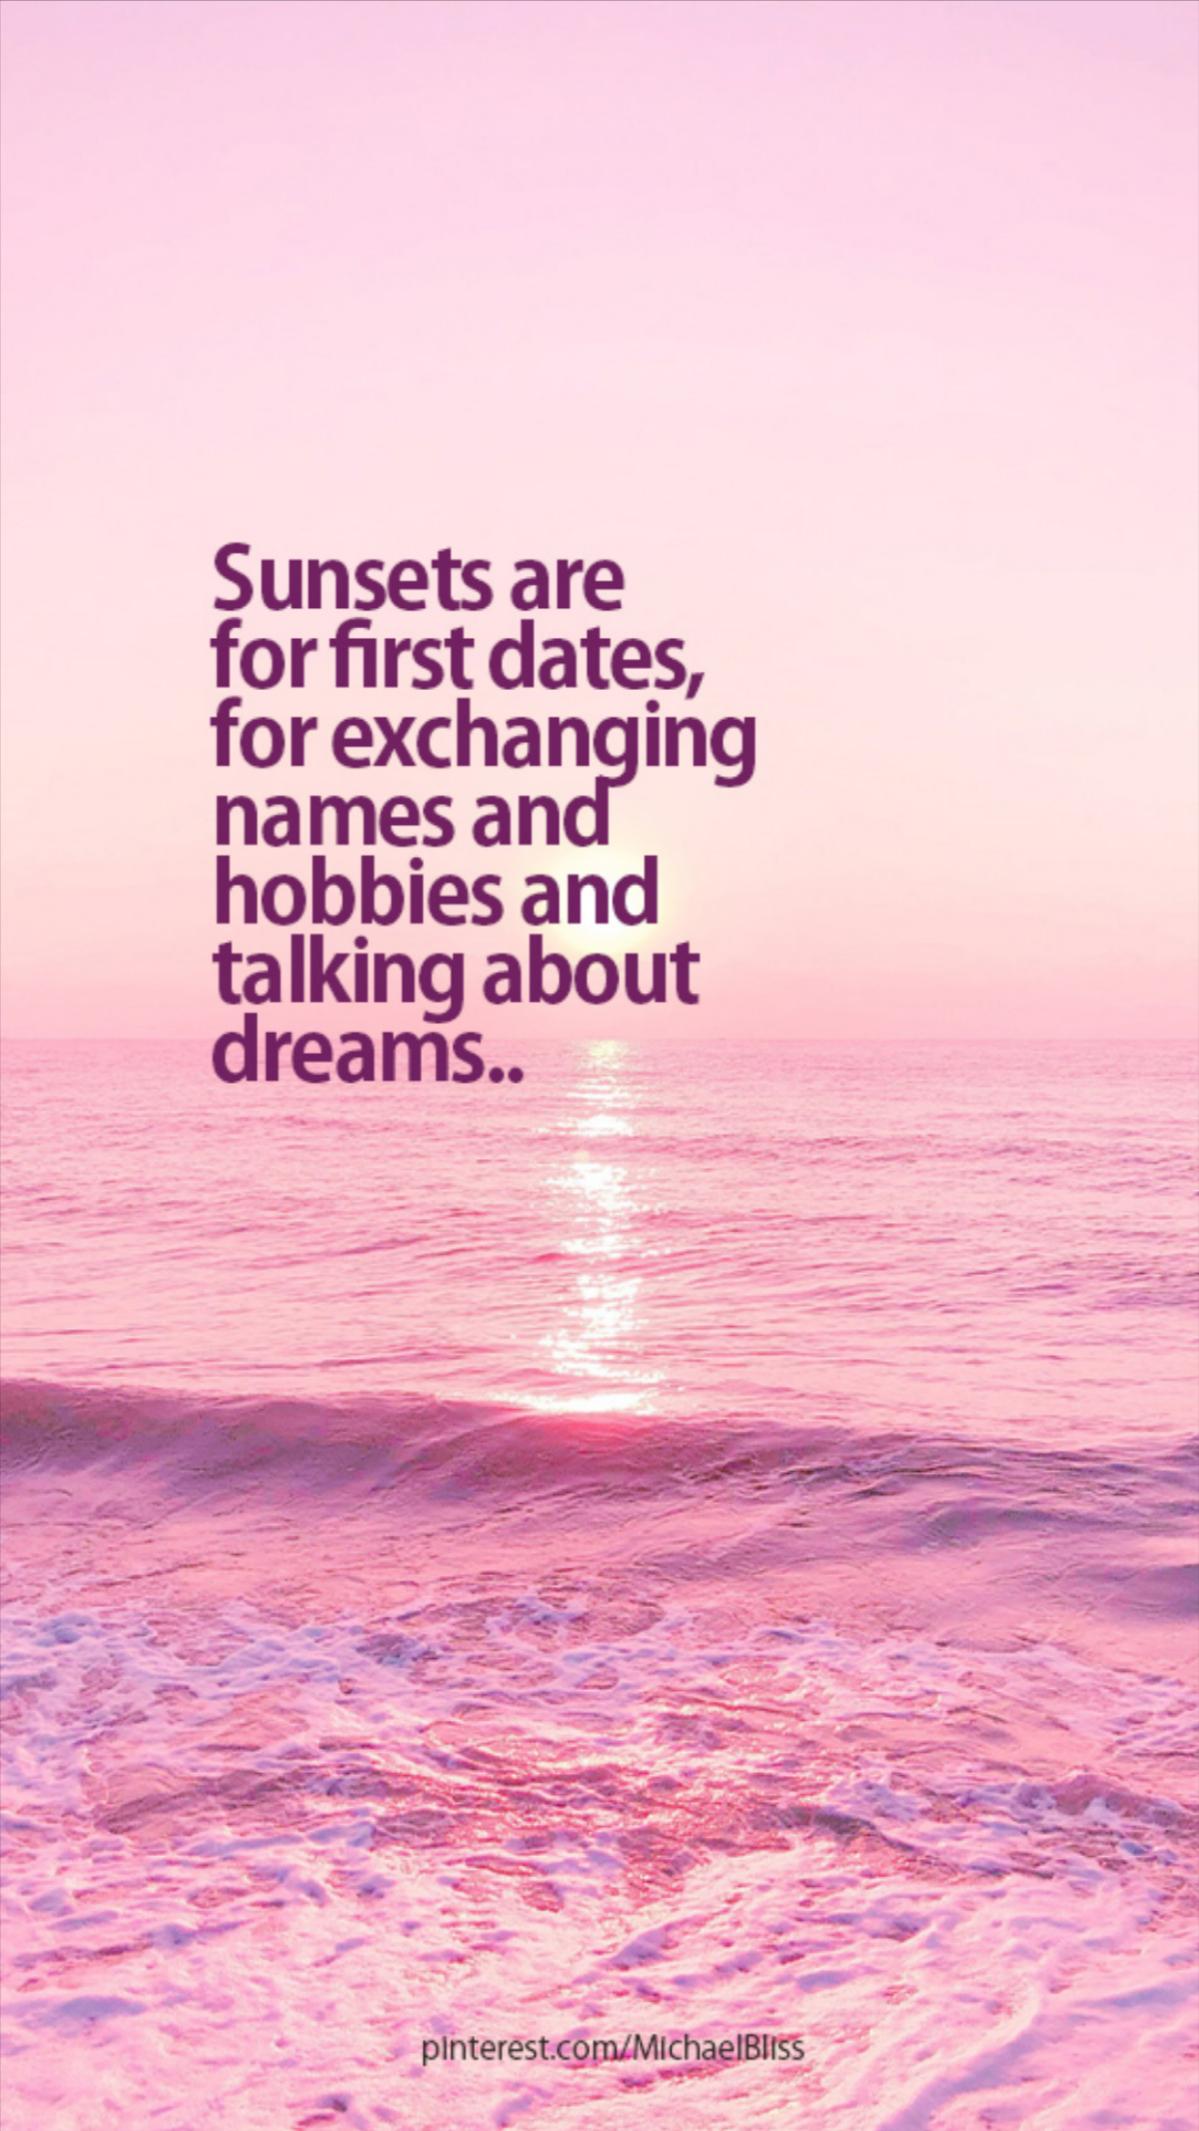 Sunrises are where life begins